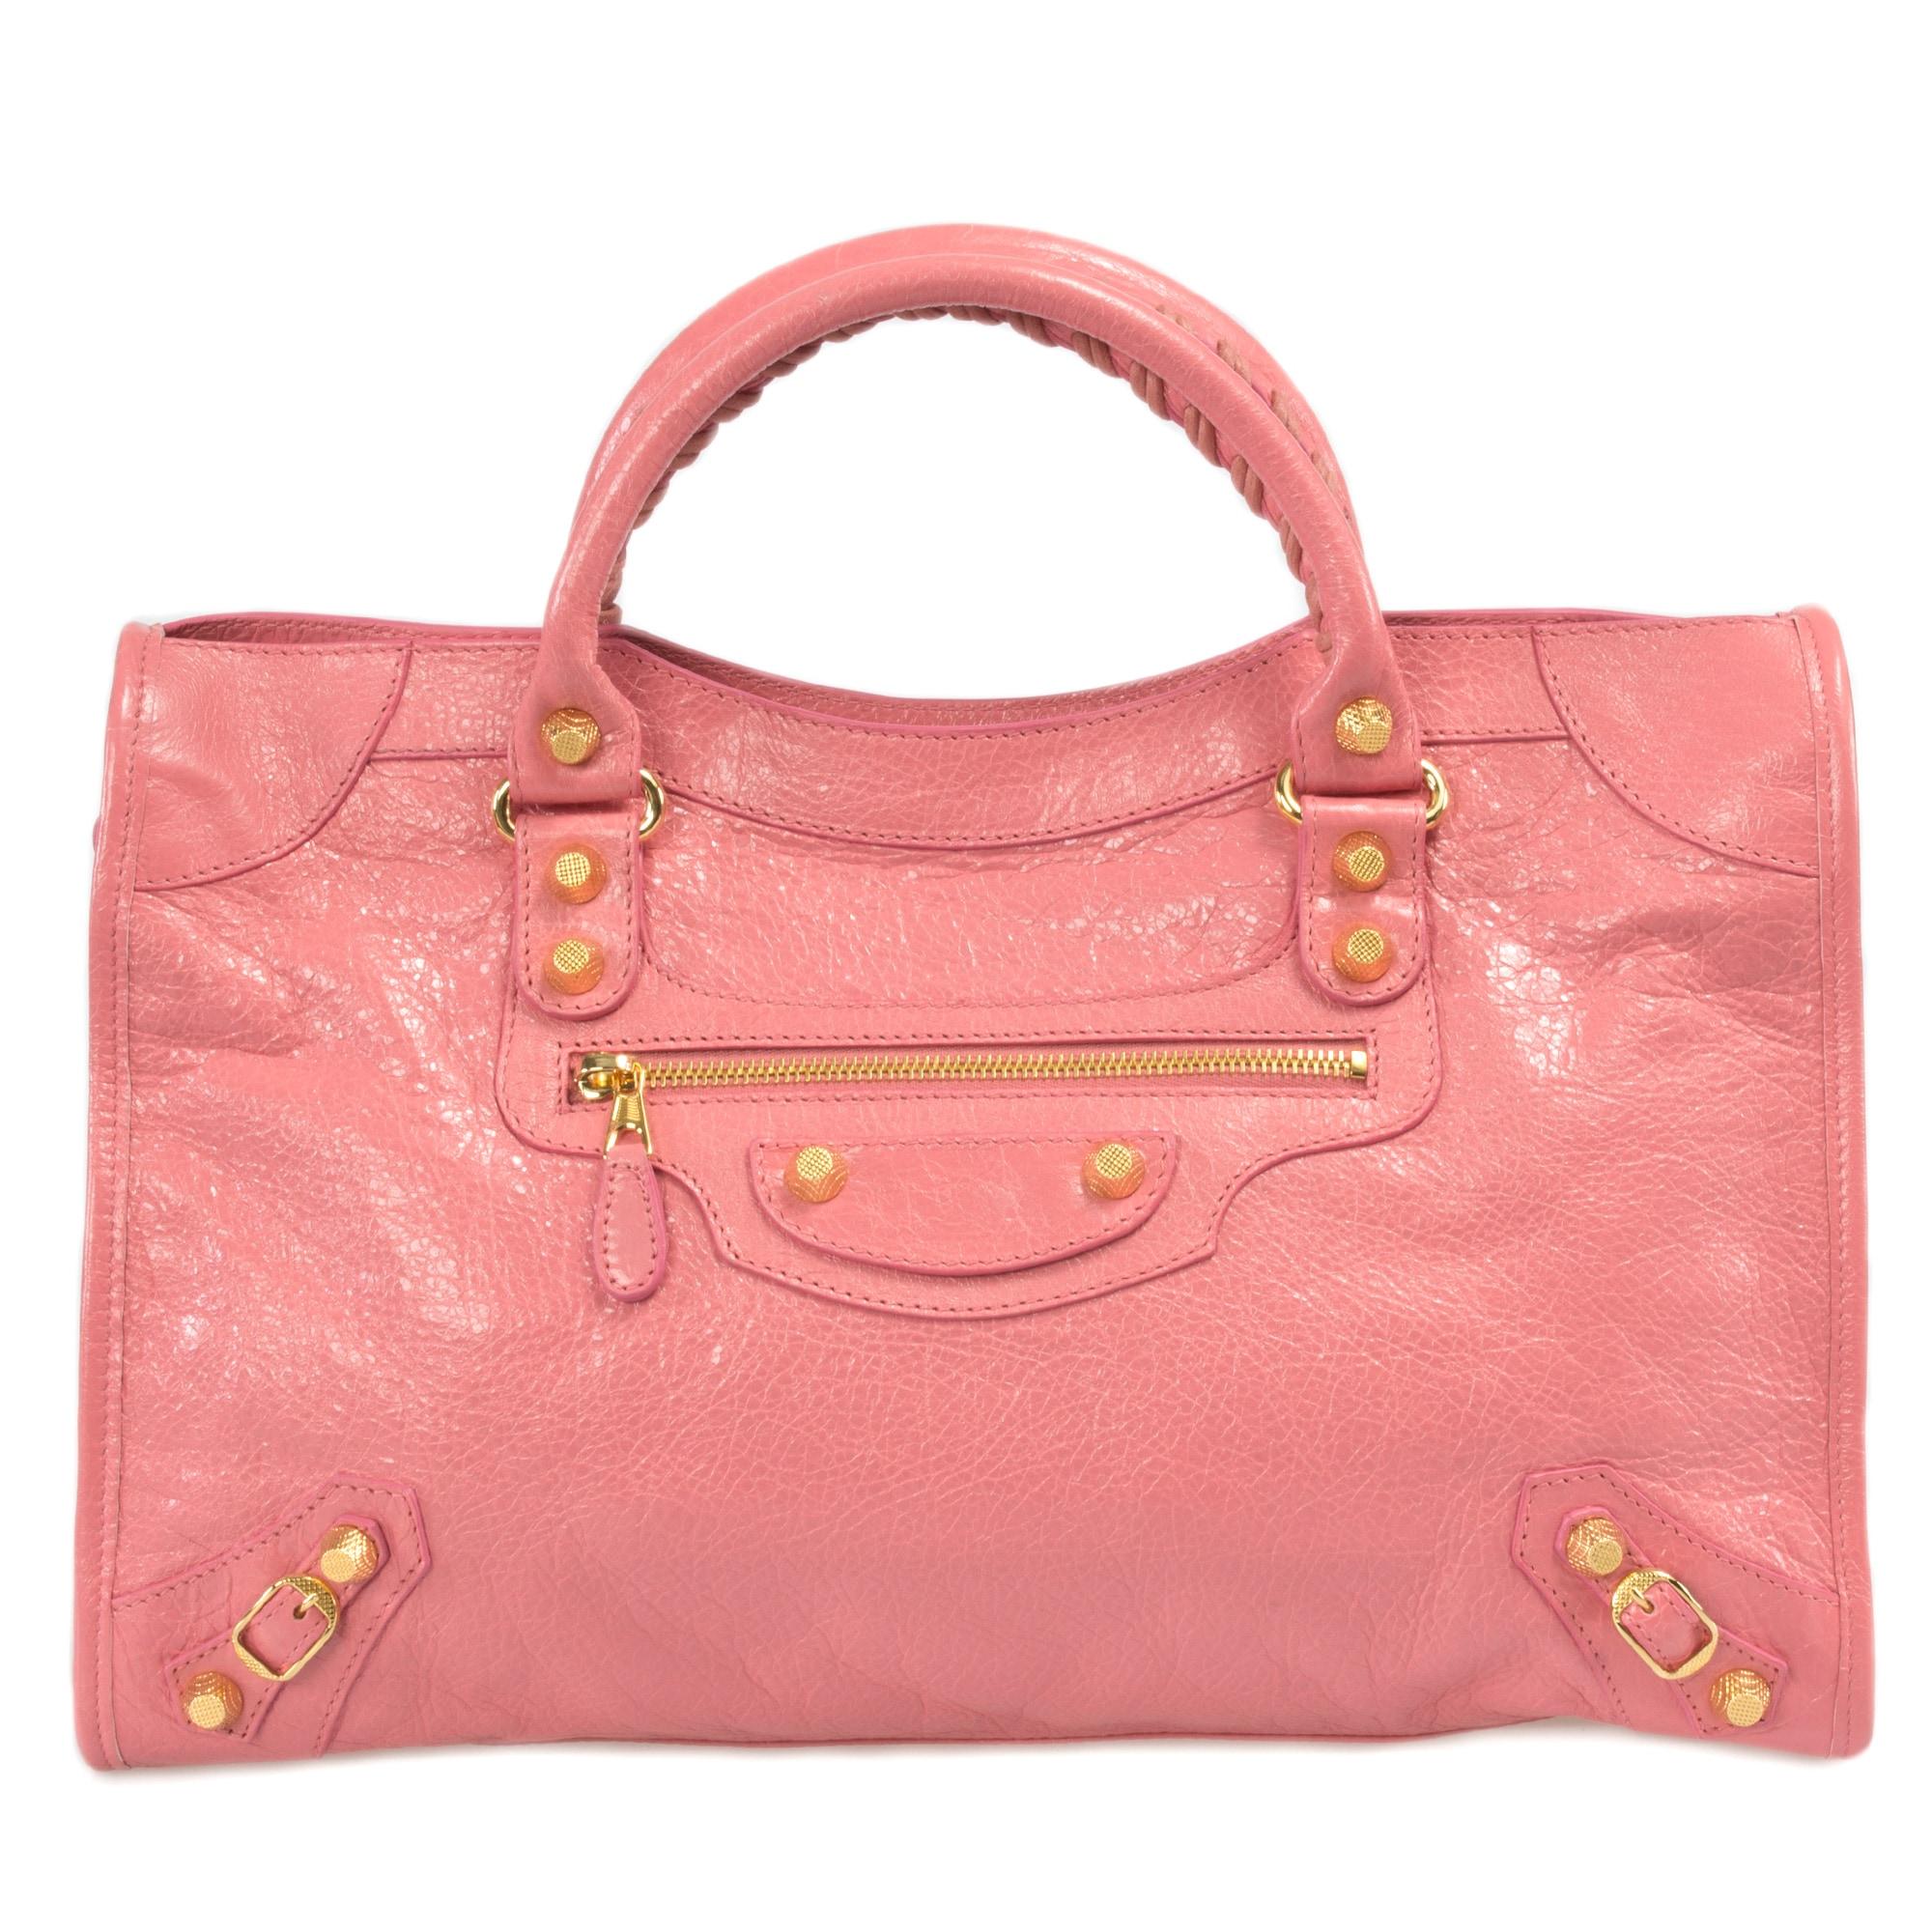 Balenciaga Giant 12 Gold City Medium Leather Bag in Rose Jaipur